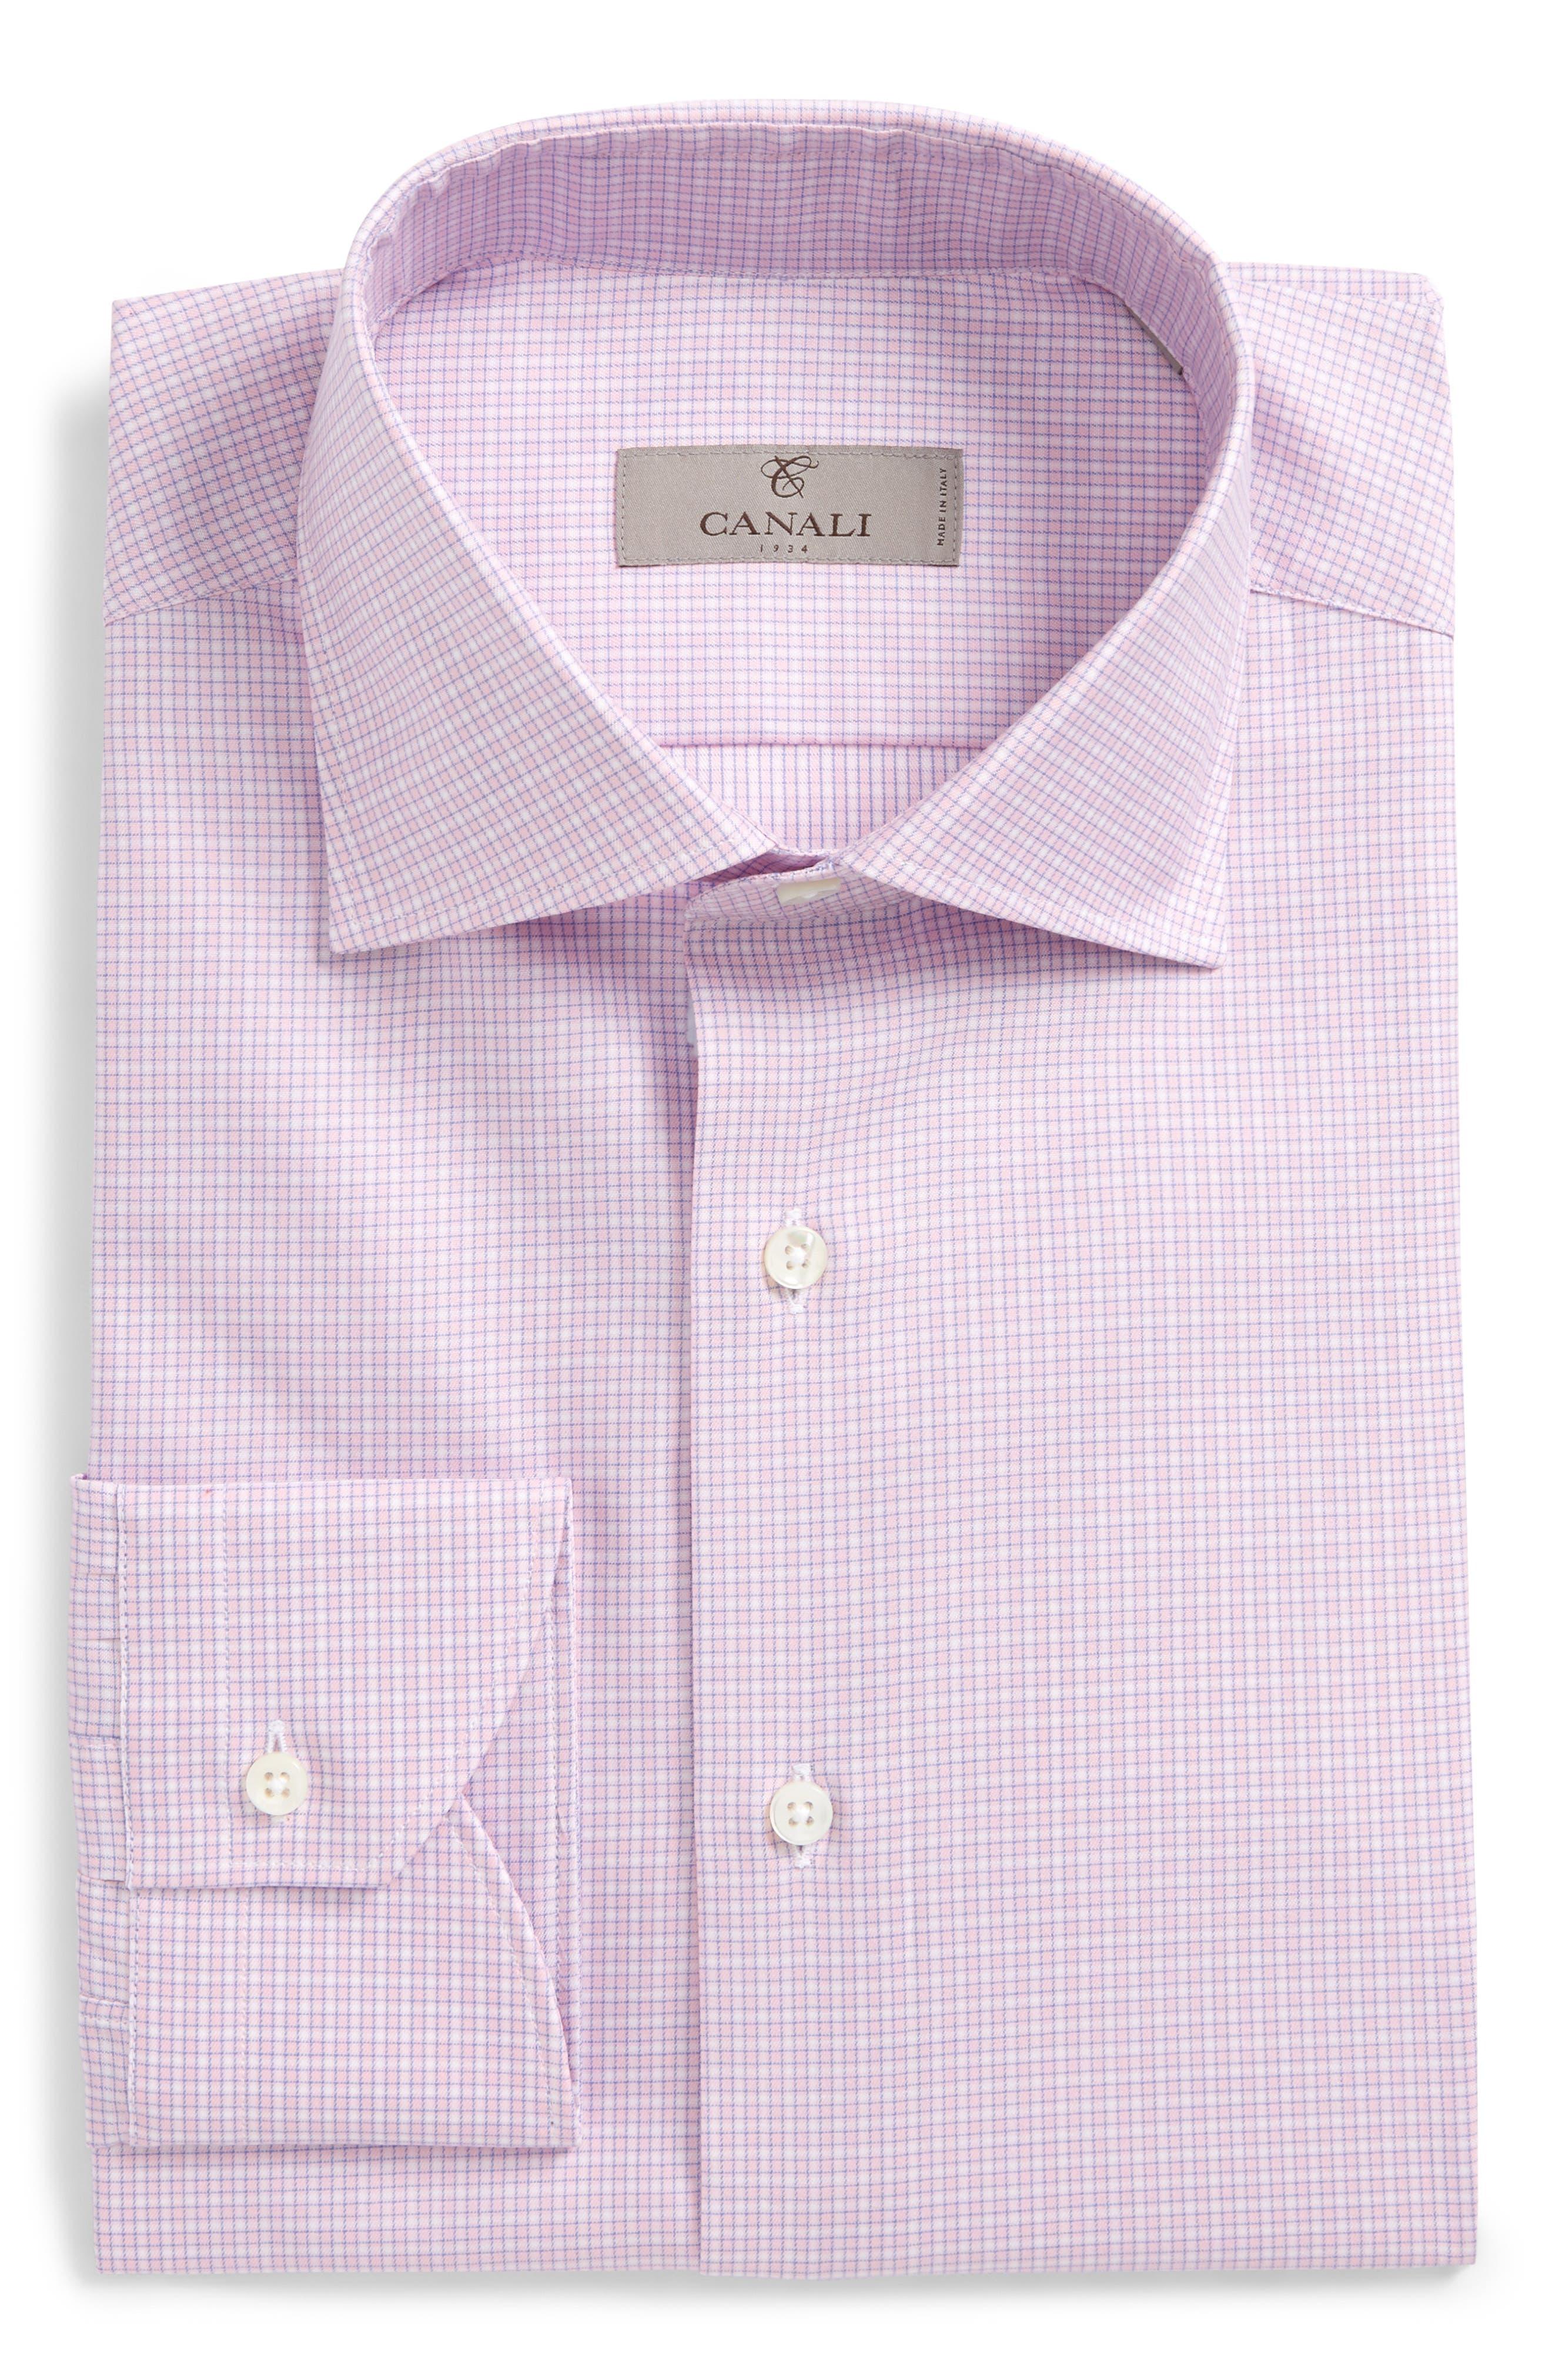 Regular Fit Check Dress Shirt,                         Main,                         color, Pink